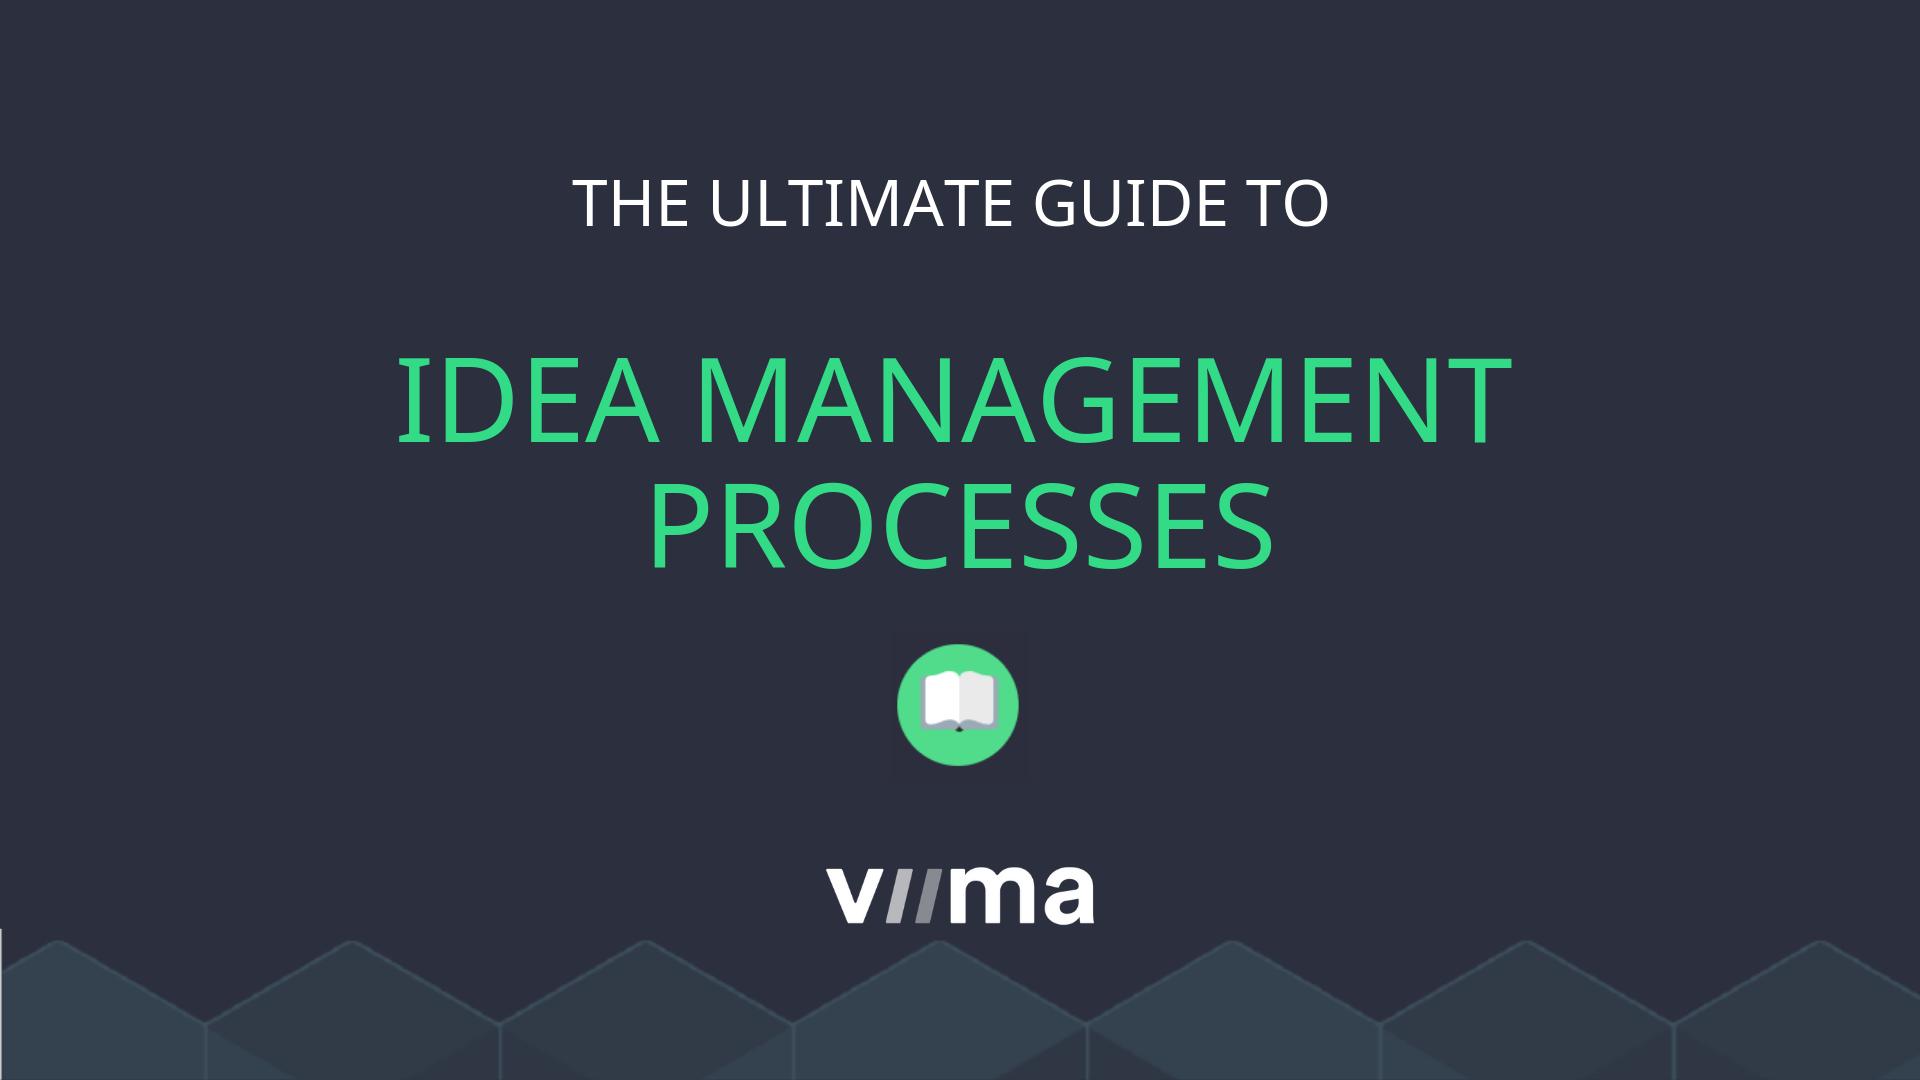 idea management process featured image